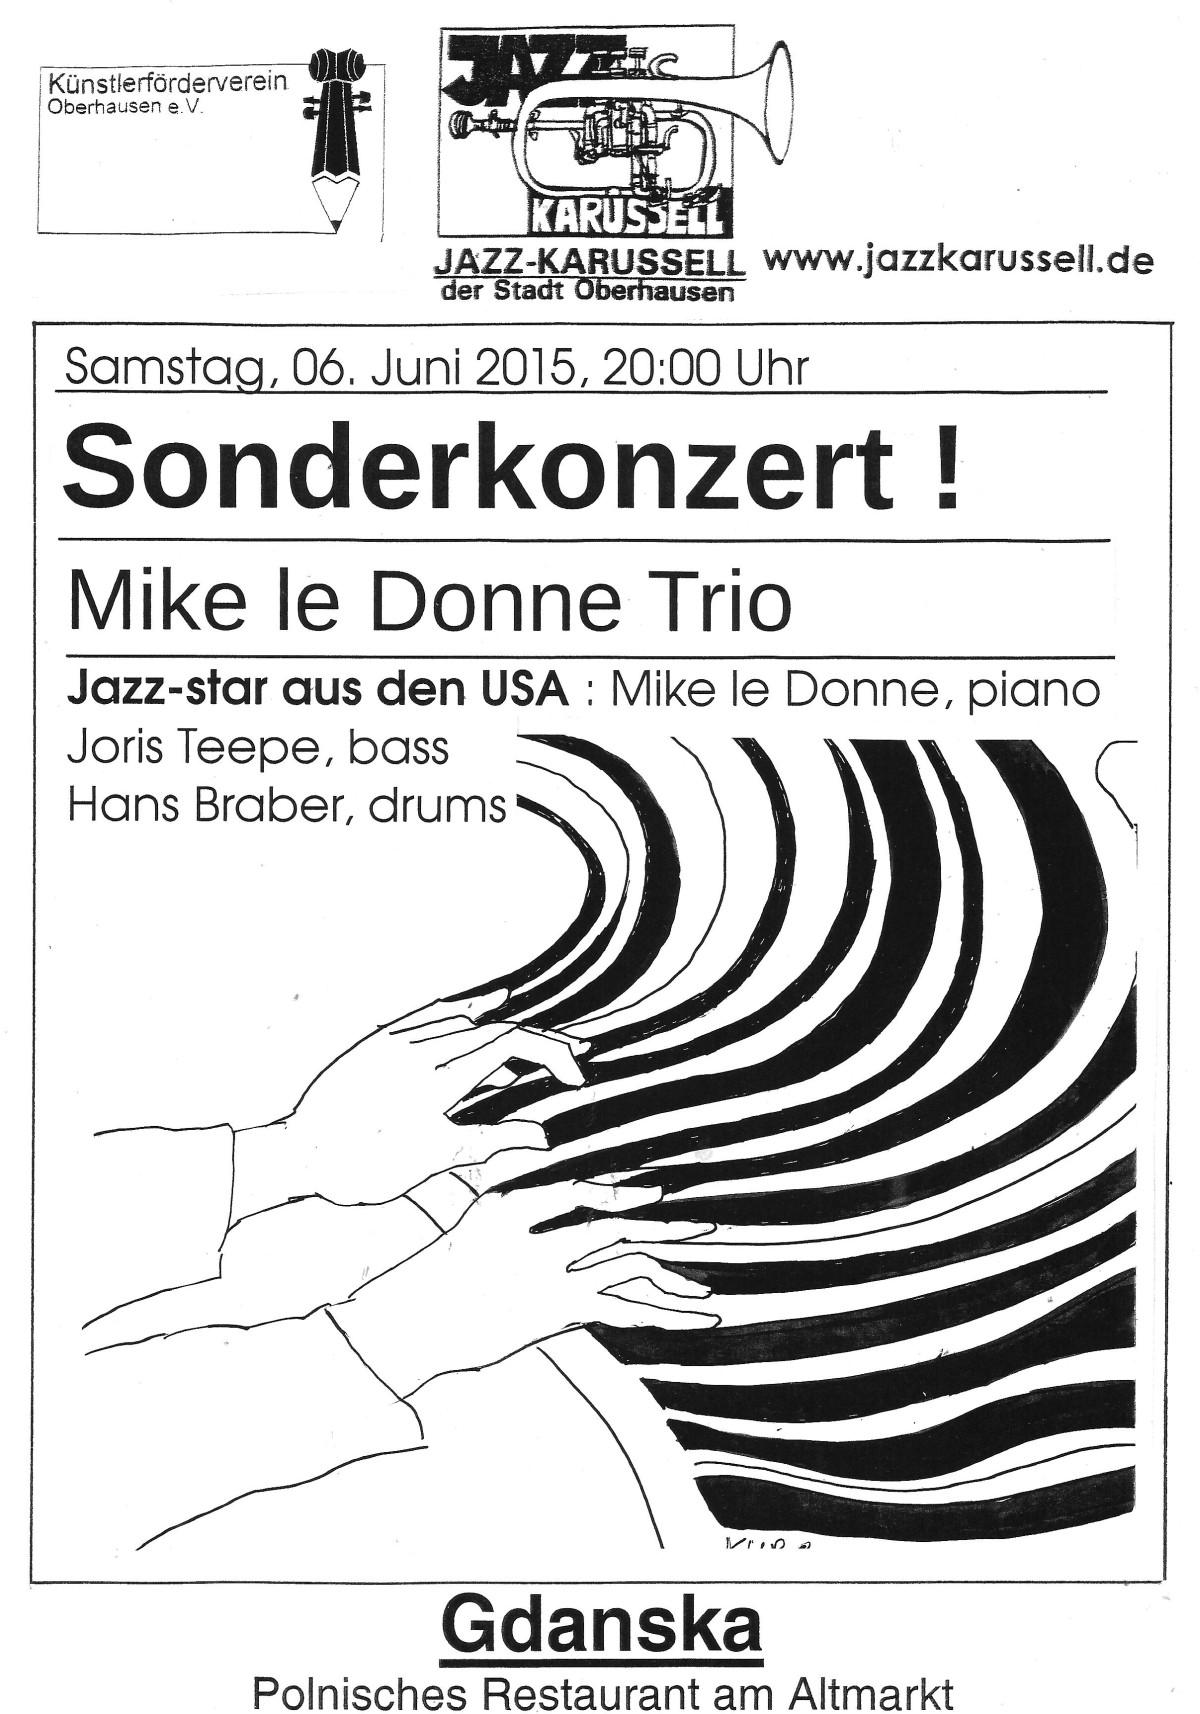 jazz 06.06.15